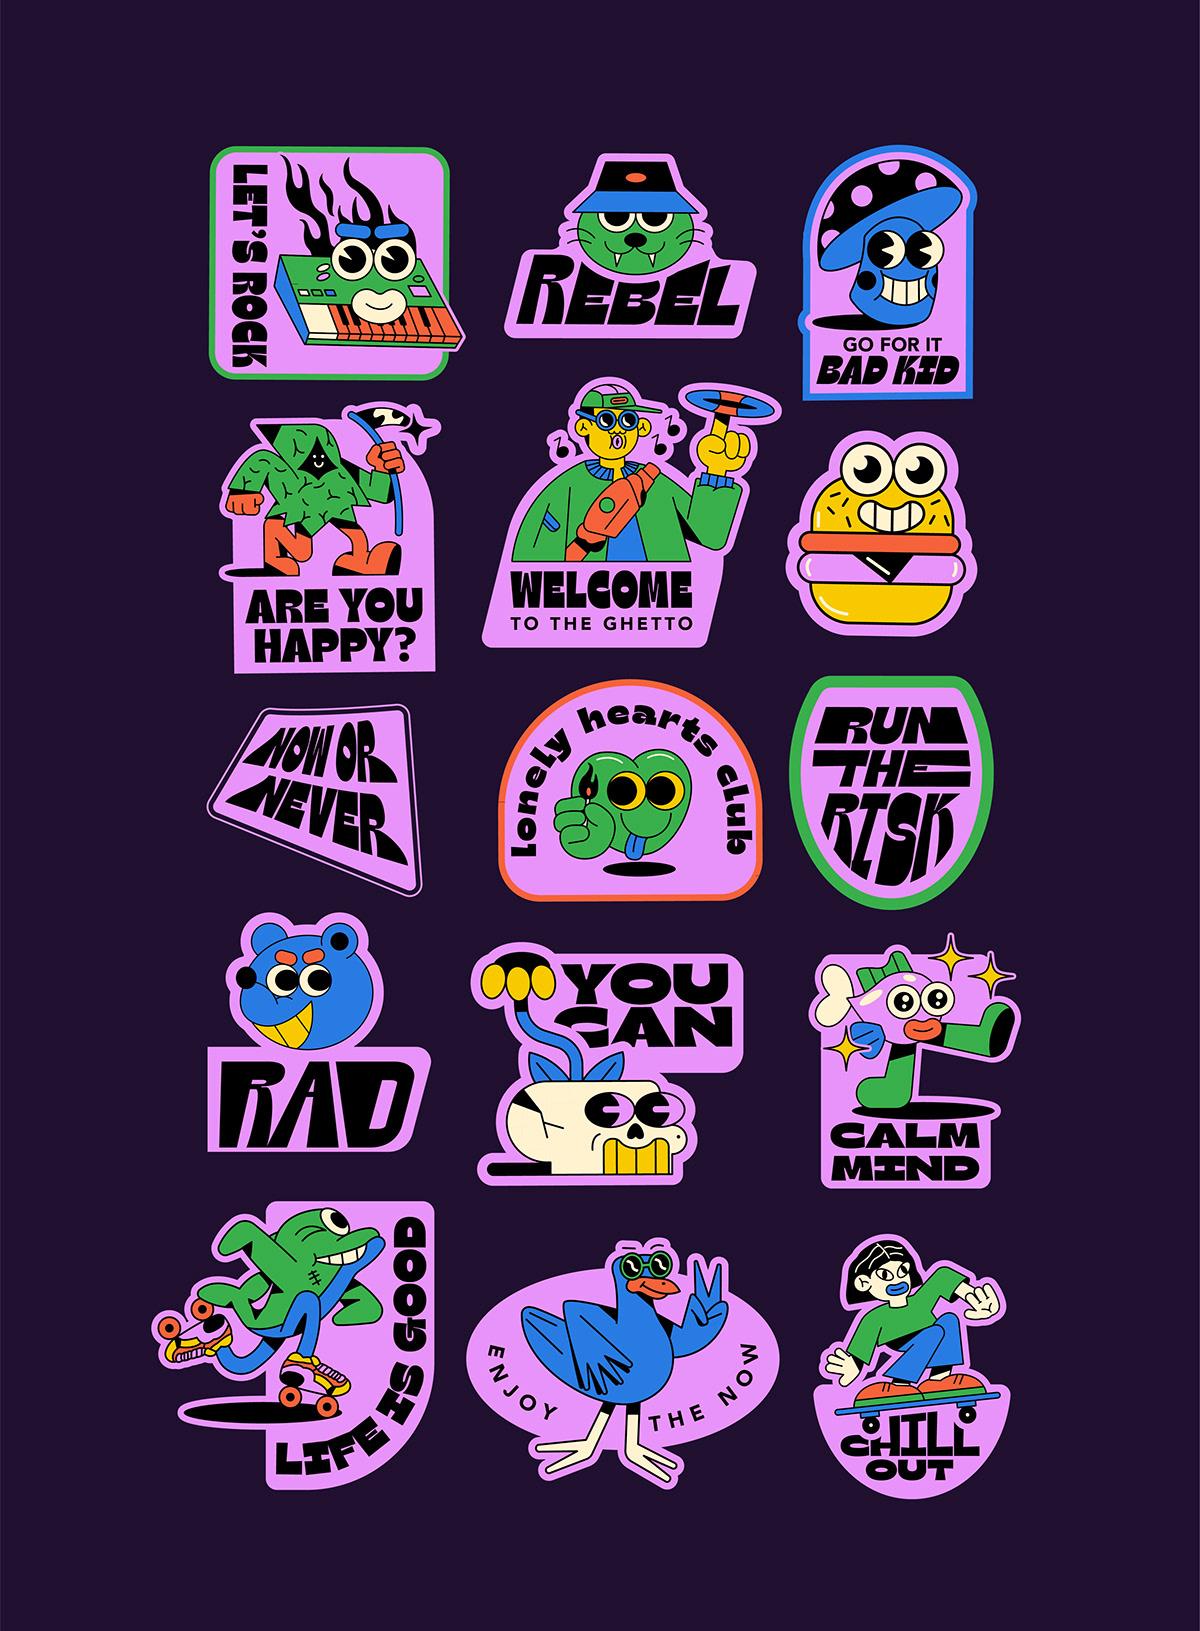 antonay Character characterdesign design diseño diseñografico graphicdesign ILLUSTRATION  ilustracion personajes